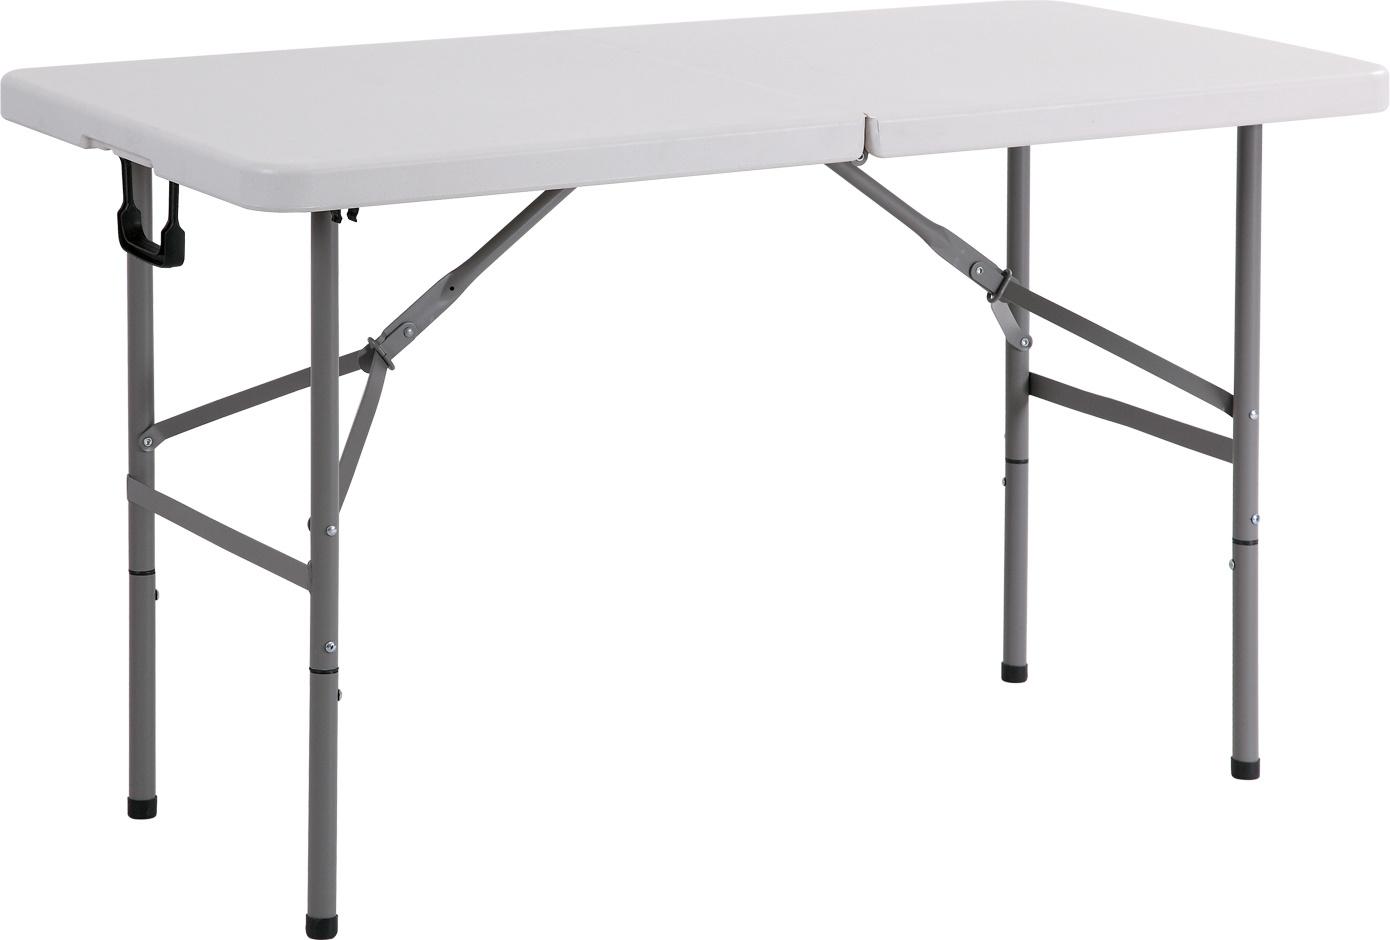 8 ft fold in half table - 8 Ft Fold In Half Table 41